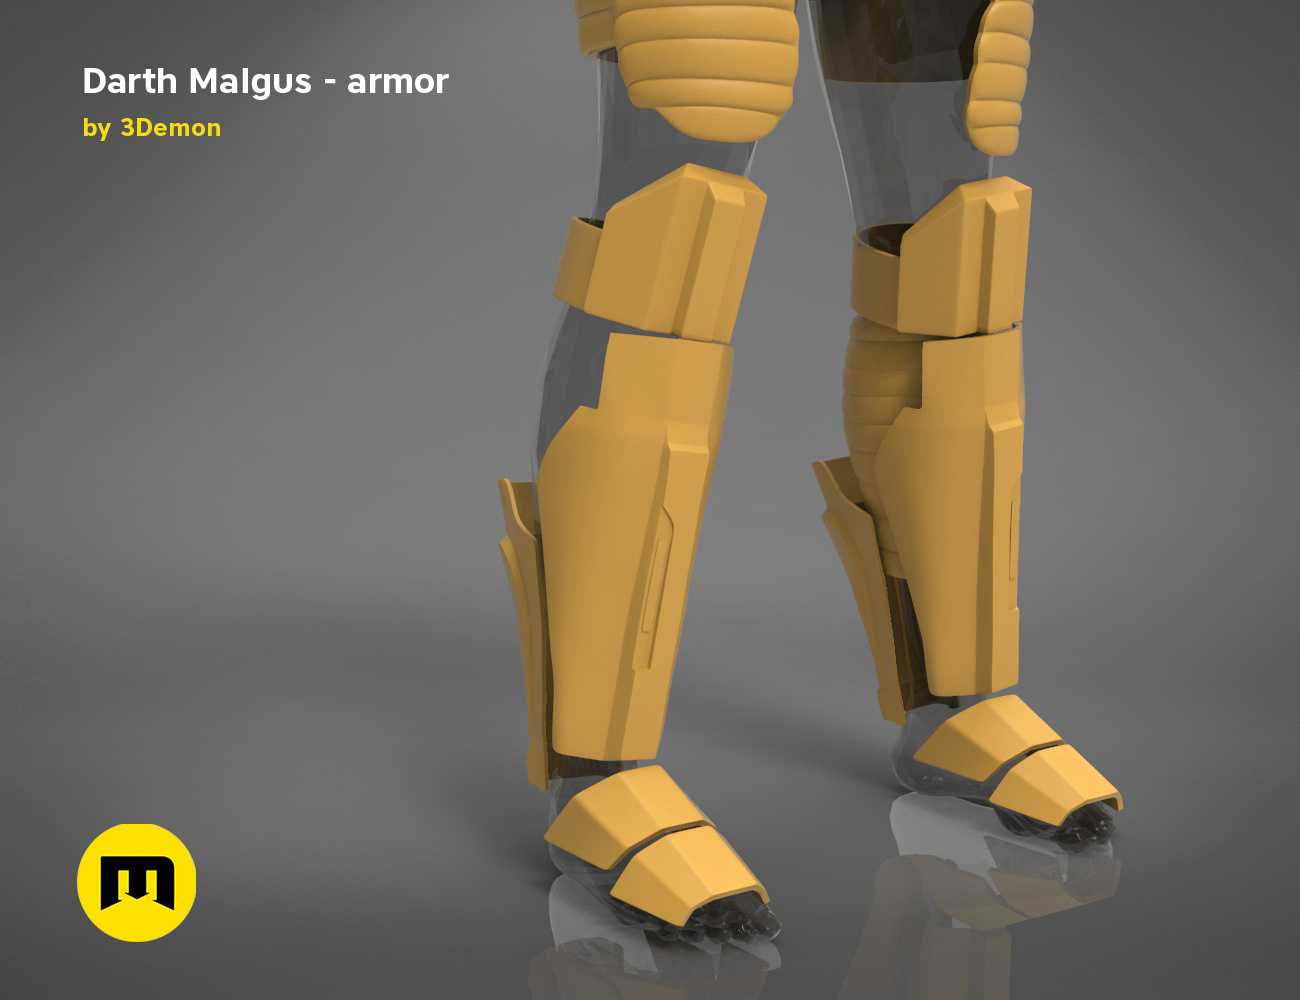 Darth-Malgus-armor-render_scene_basic.106 kopie.jpg Download STL file Darth Malgus's full size armor • Design to 3D print, 3D-mon